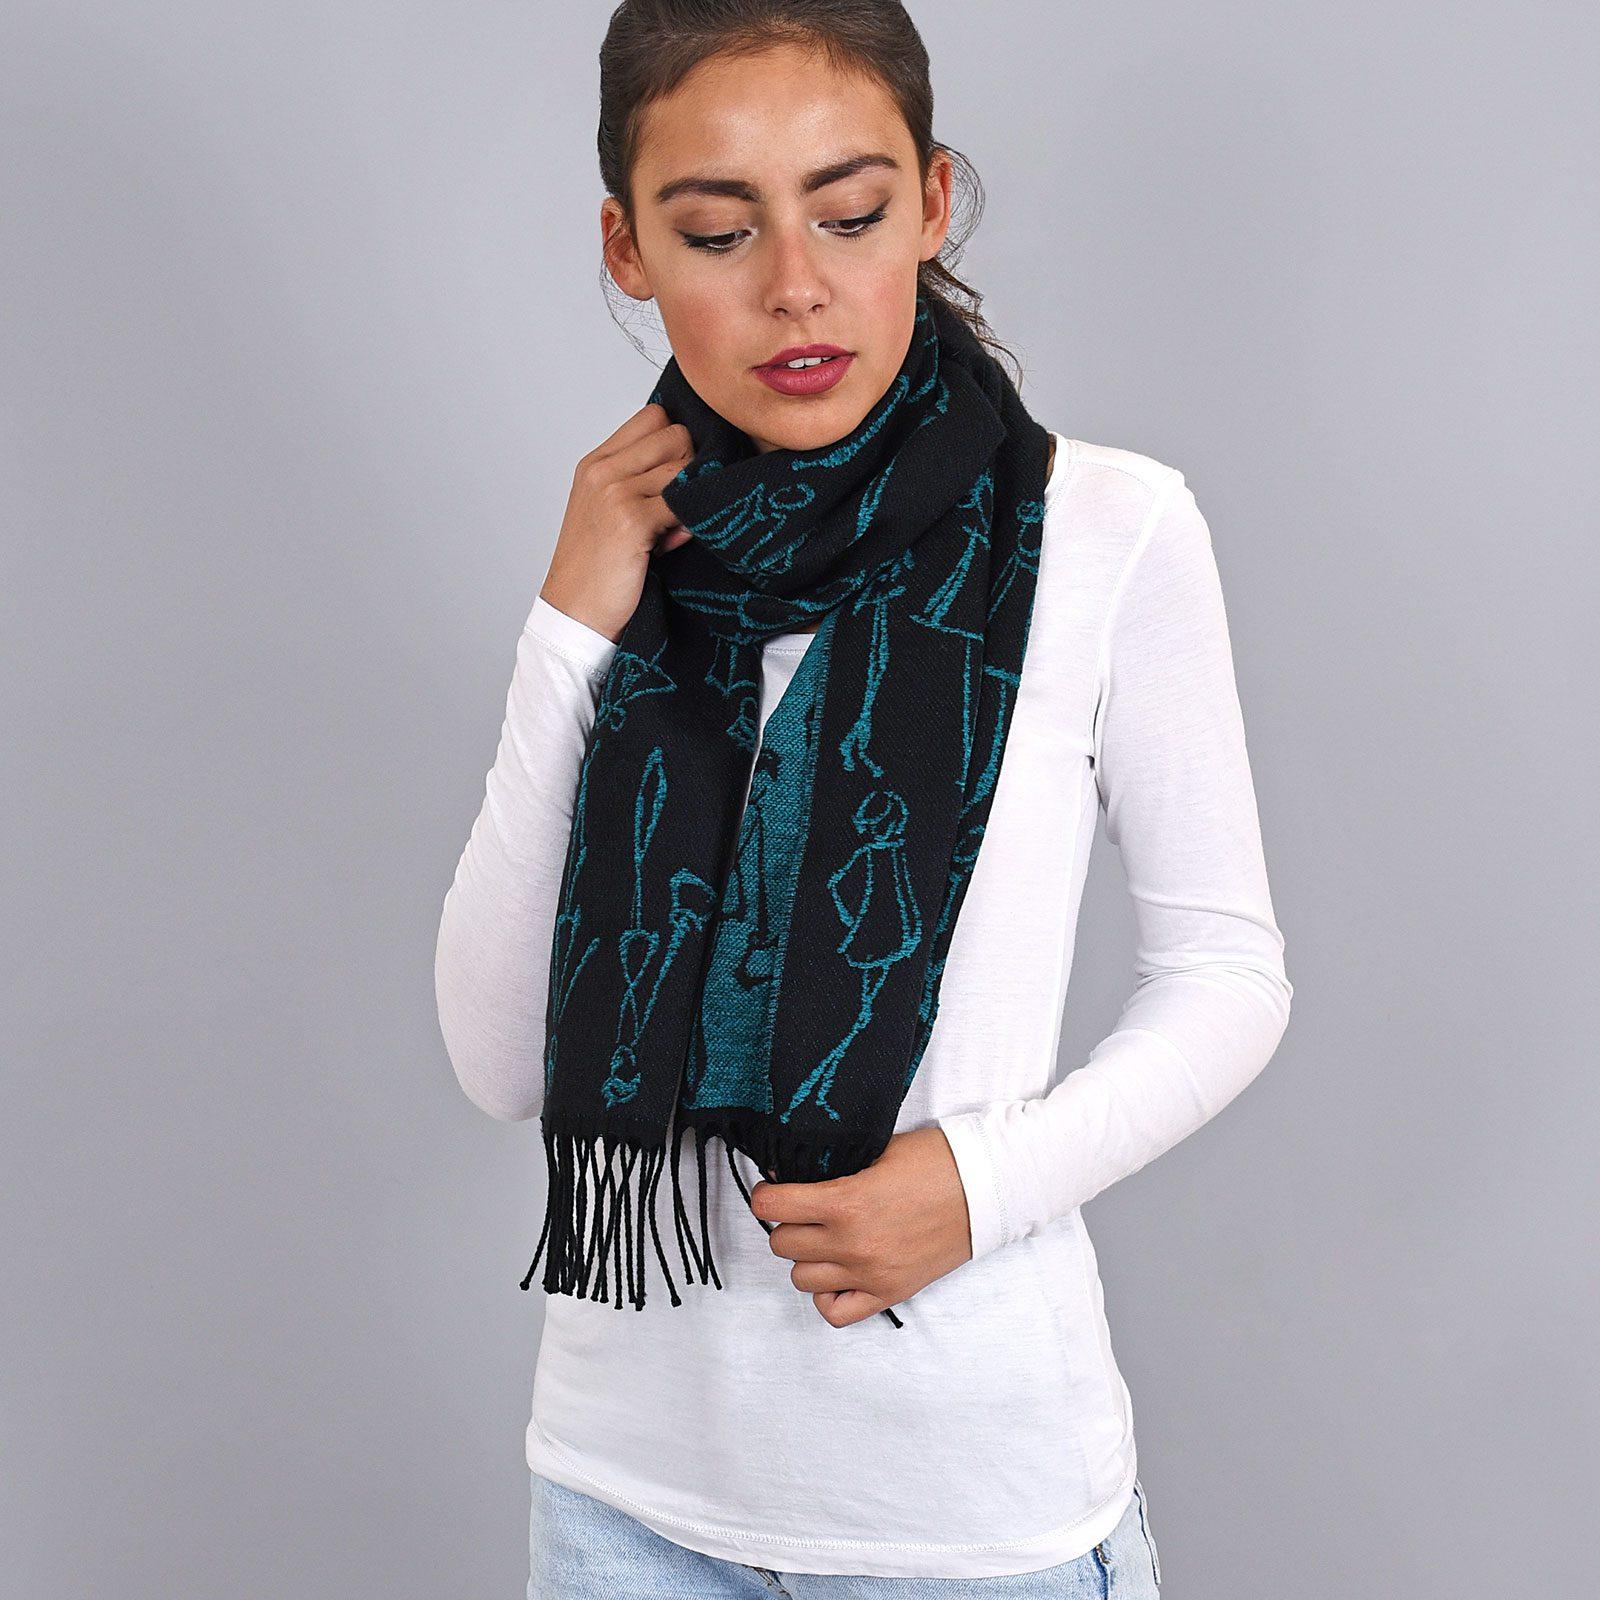 http://lookbook.allee-du-foulard.fr/wp-content/uploads/2019/01/AT-03942-VF16-echarpe-femme-noire-verte-1600x1600.jpg